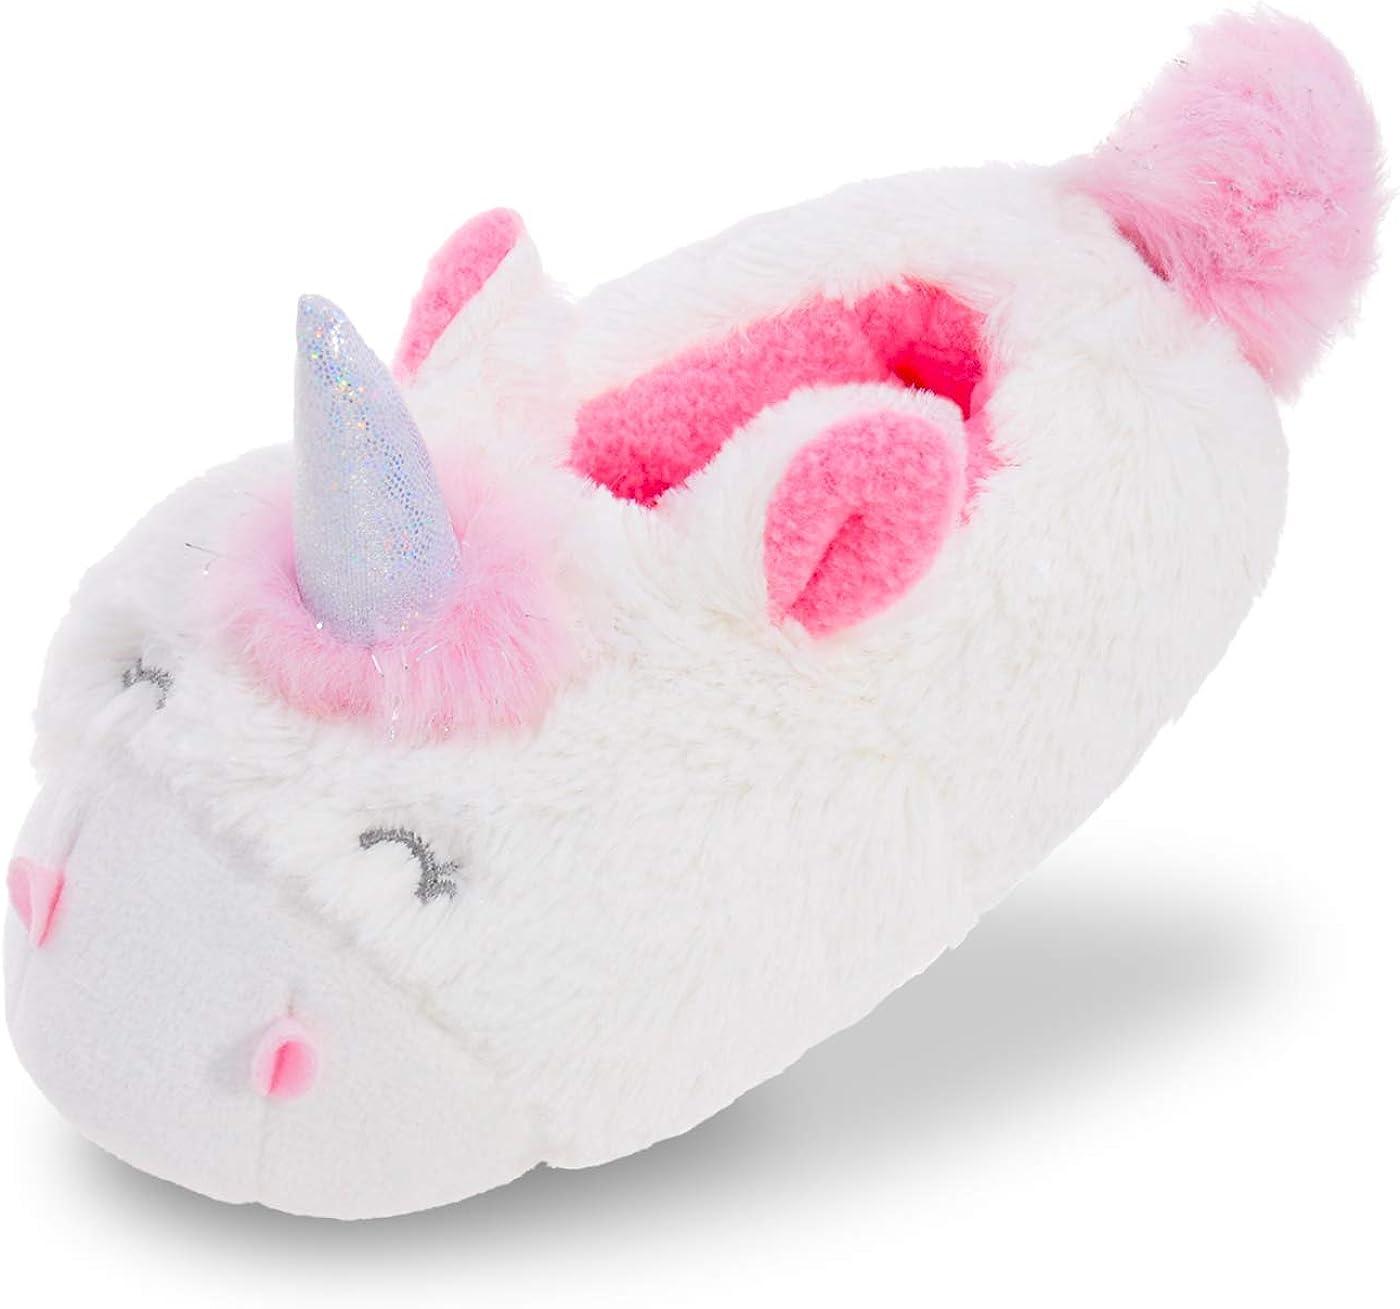 Amazon Com Mixin Girls Unicorn Slipper For Toddler Little Kids Fluffy Bedroom Slippers Anti Slip House Shoes Indoor White 6 7 M Shoes